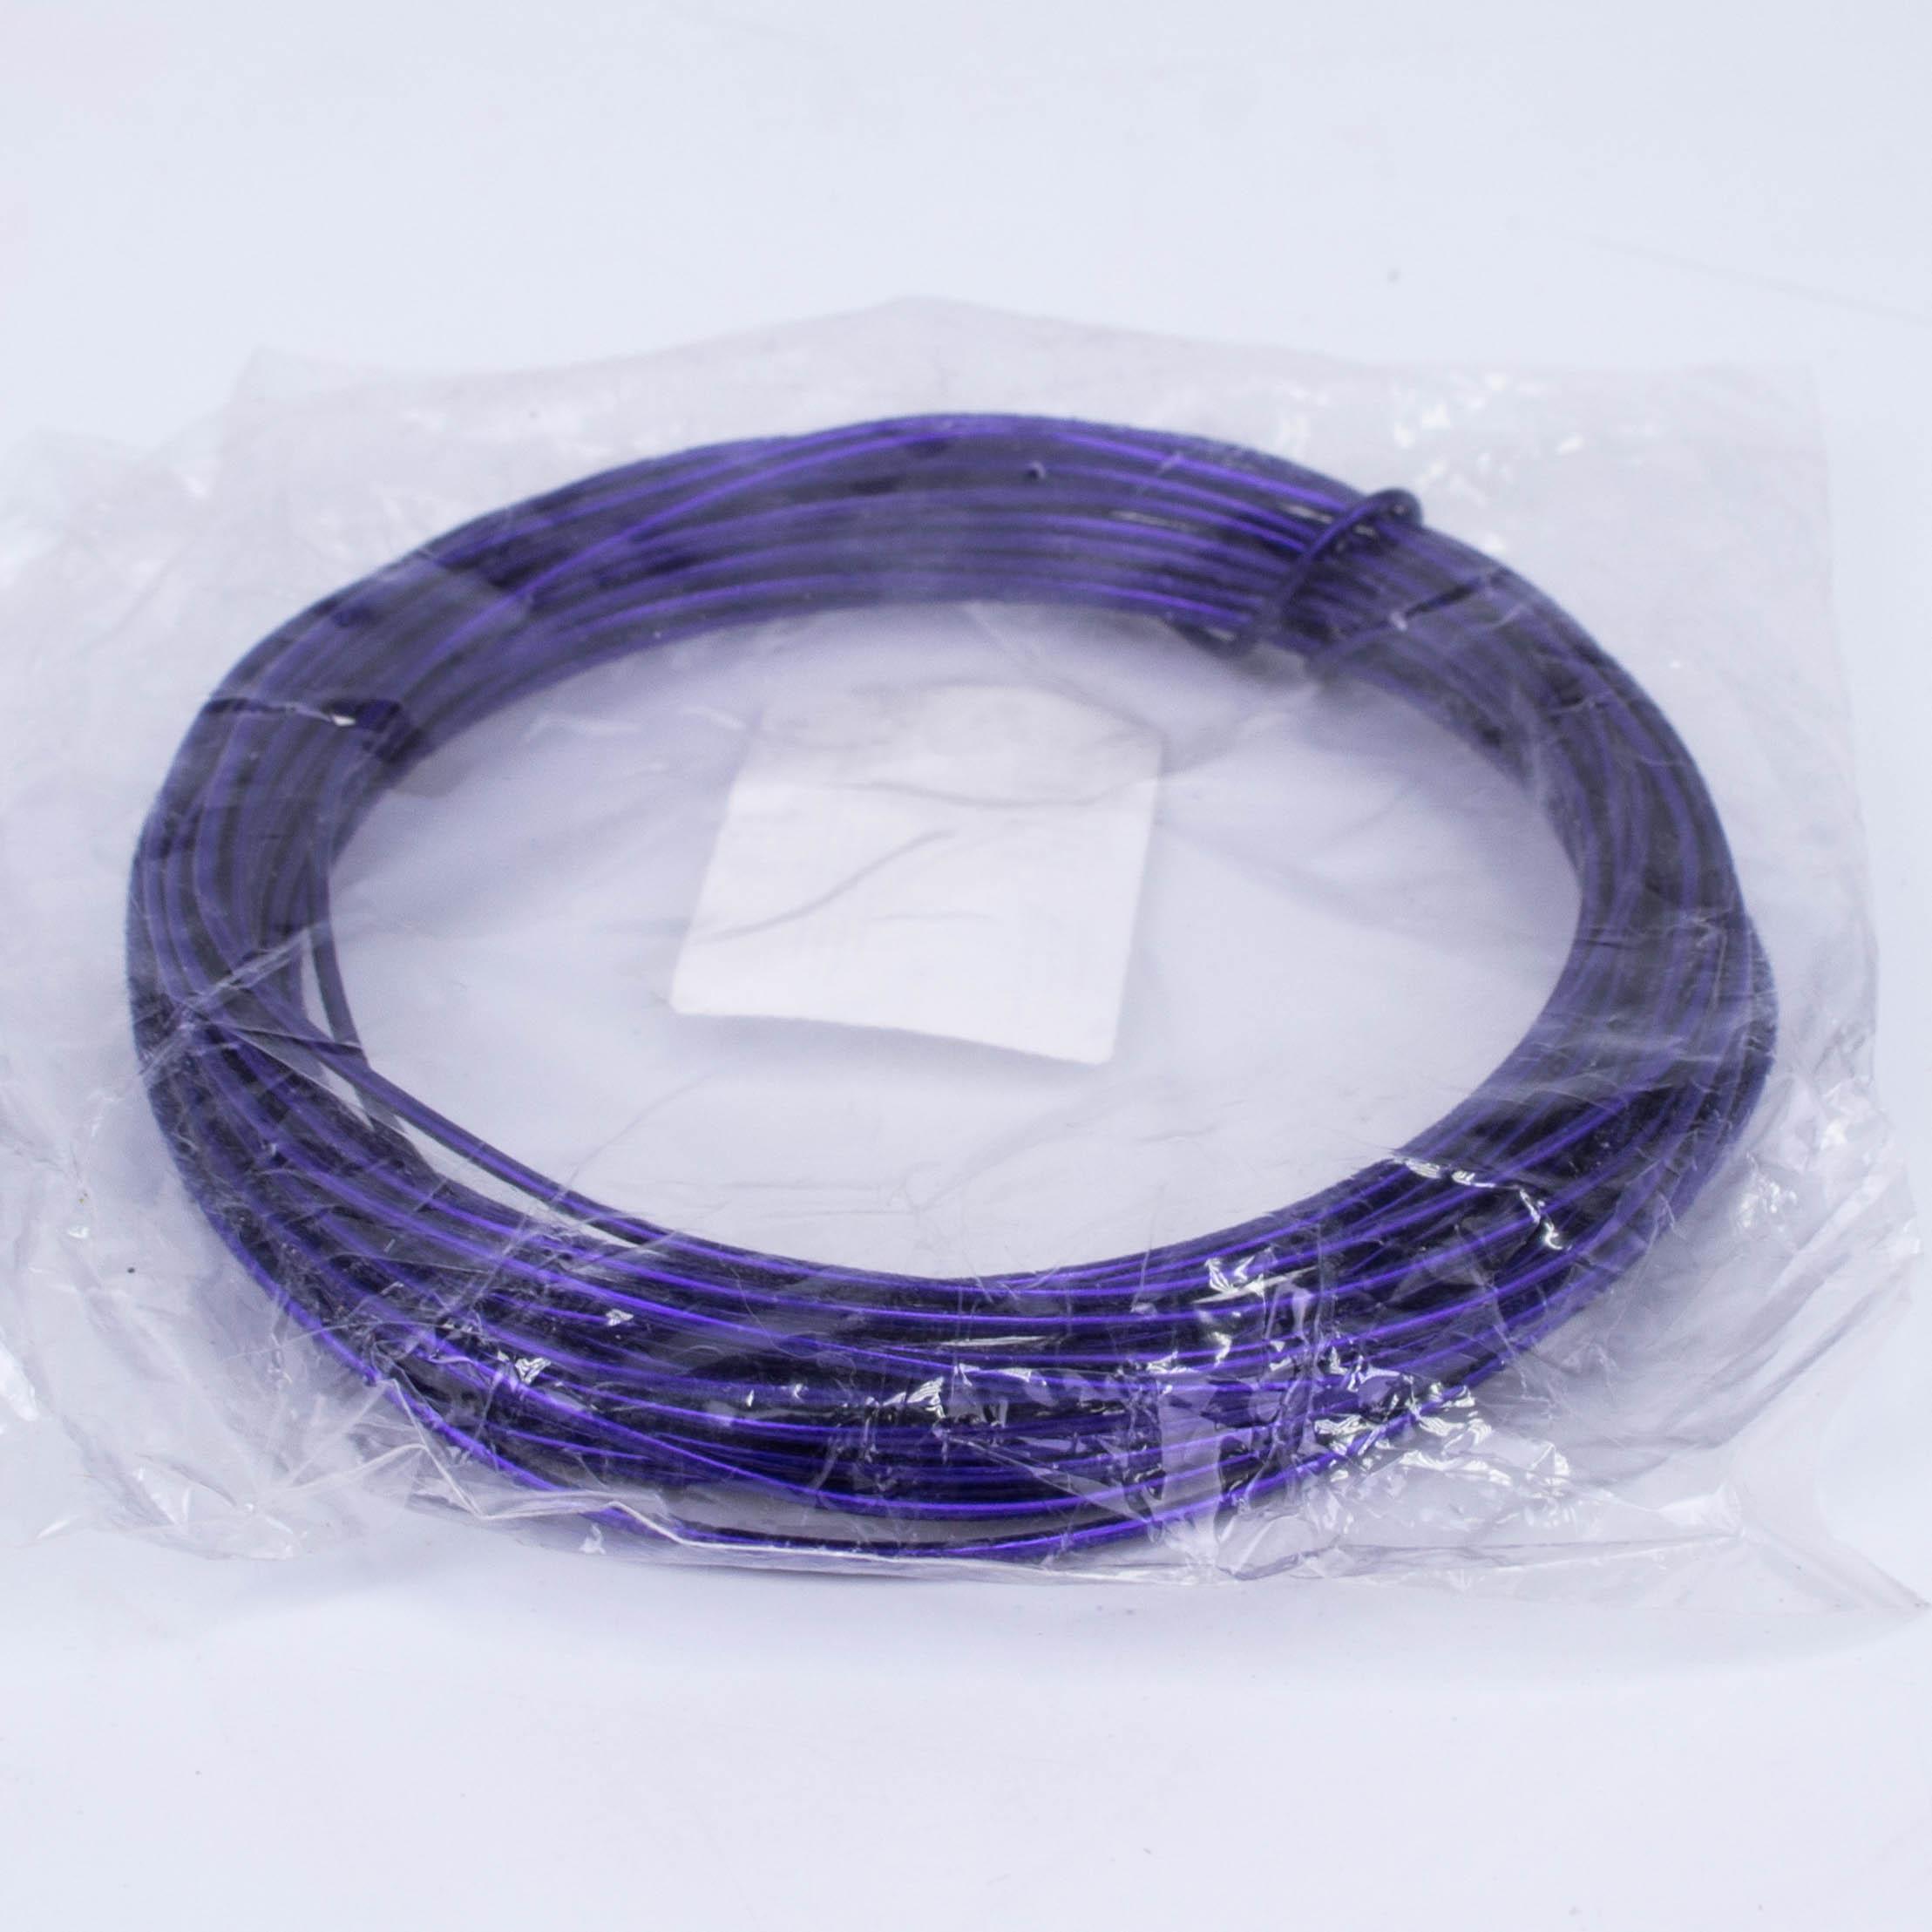 Проволока в кольцах Тёмно-Фиолетовая 2мм/12м 100гр